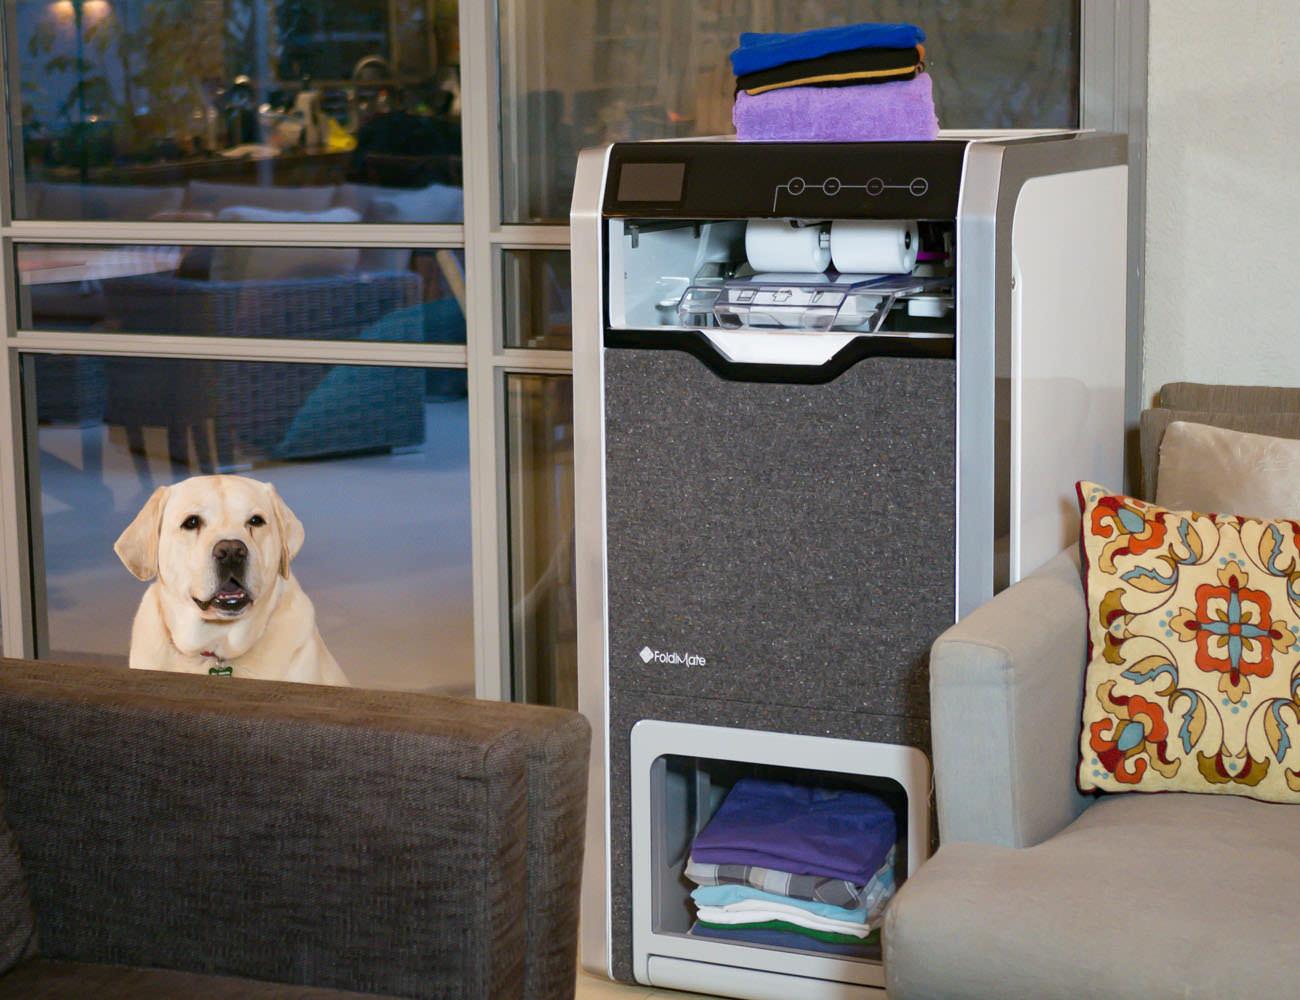 FoldiMate Automatic Laundry Folding Robot